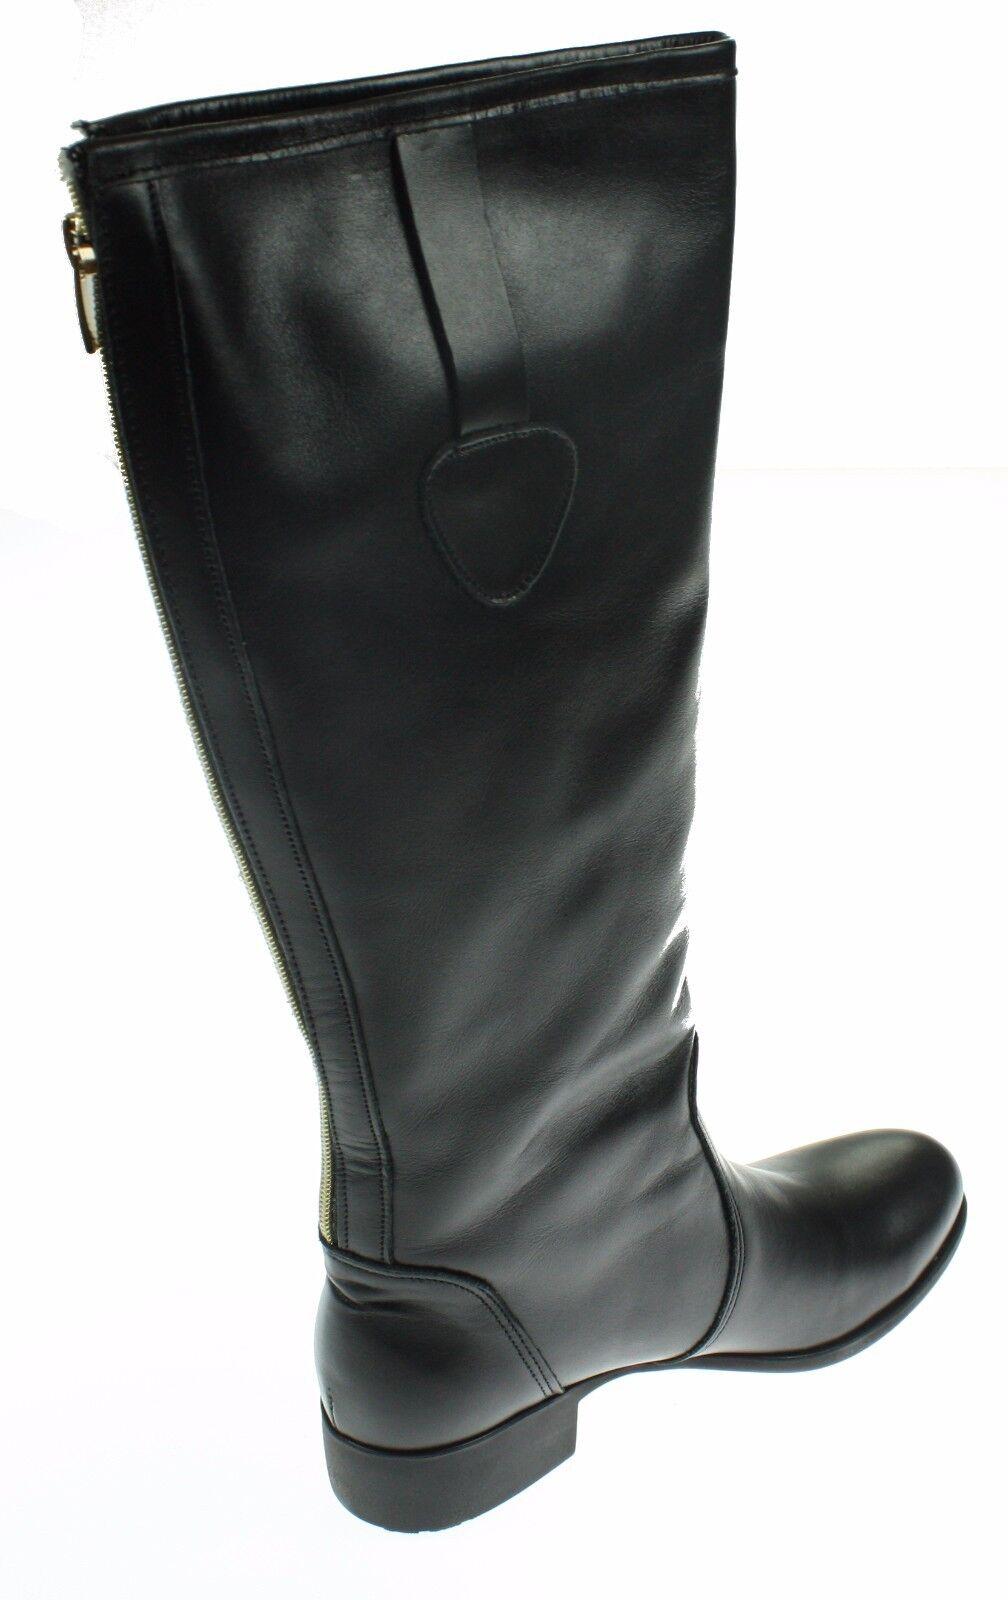 Zapato Zapato Zapato Damen Leder Stiefel, Größe 37, schwarz    580833